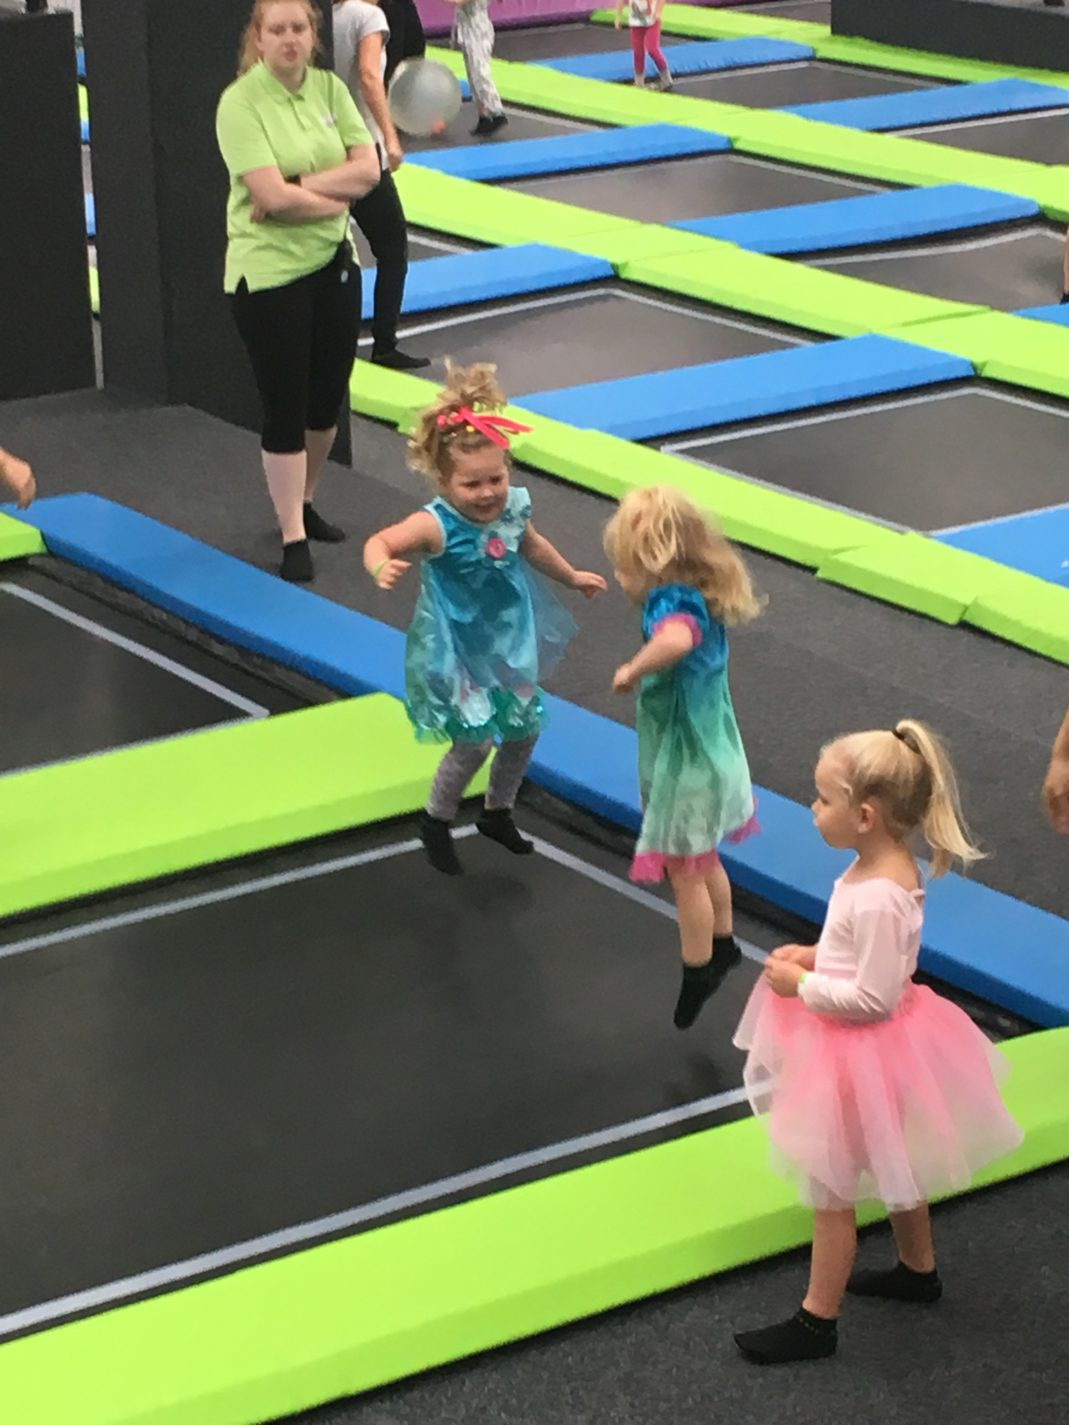 sky high trampoline park a birthday party fit for a princess